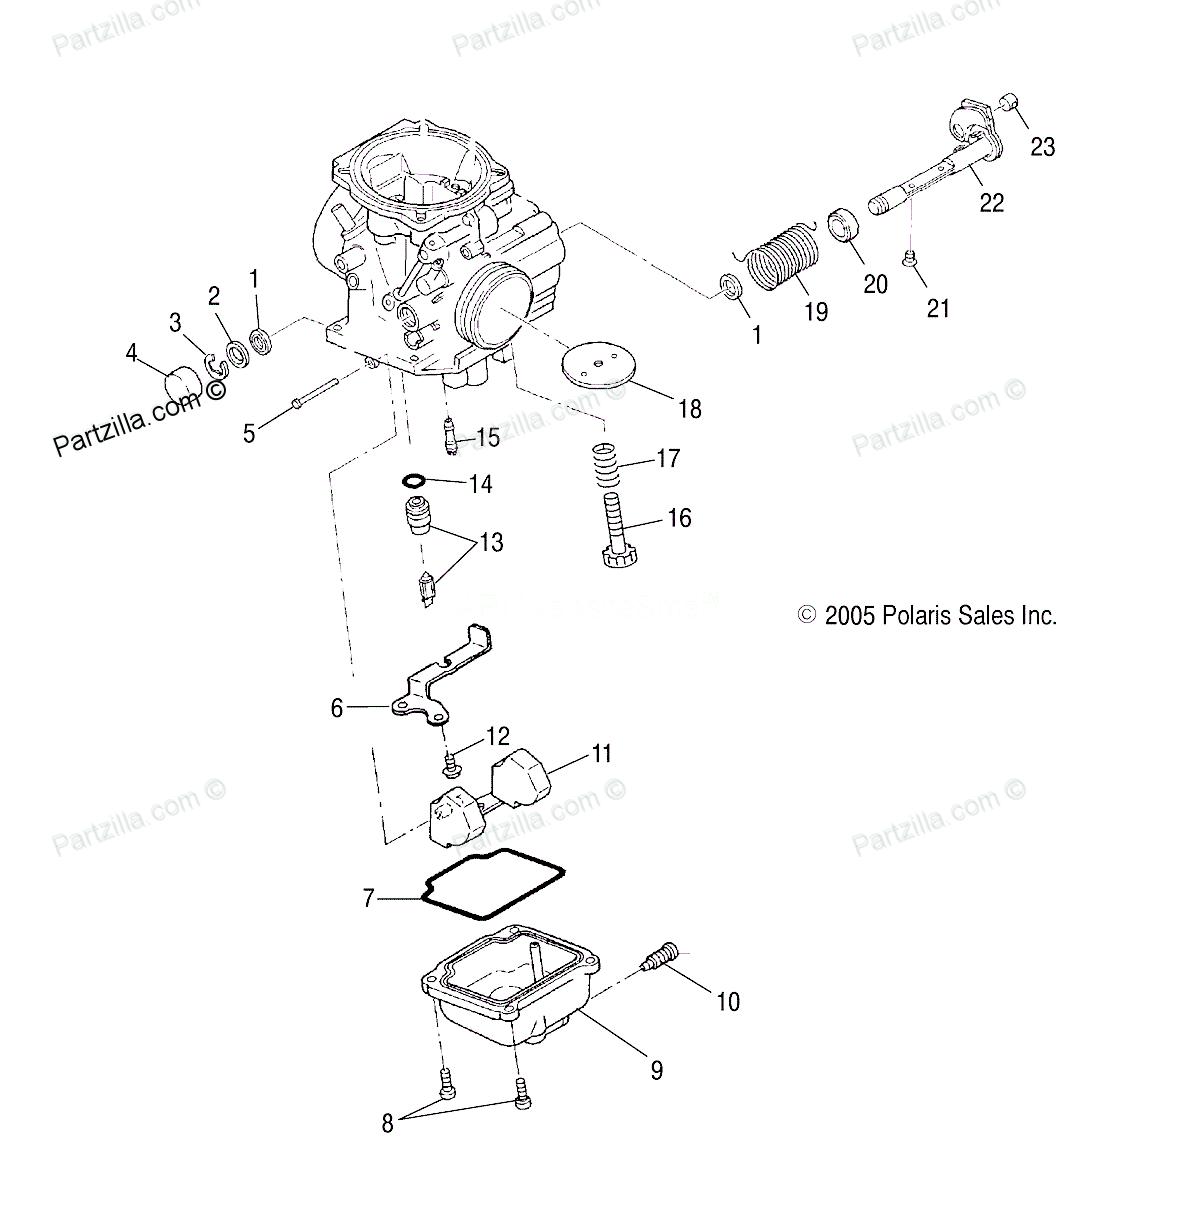 2005 polaris trail boss 330 wiring diagram